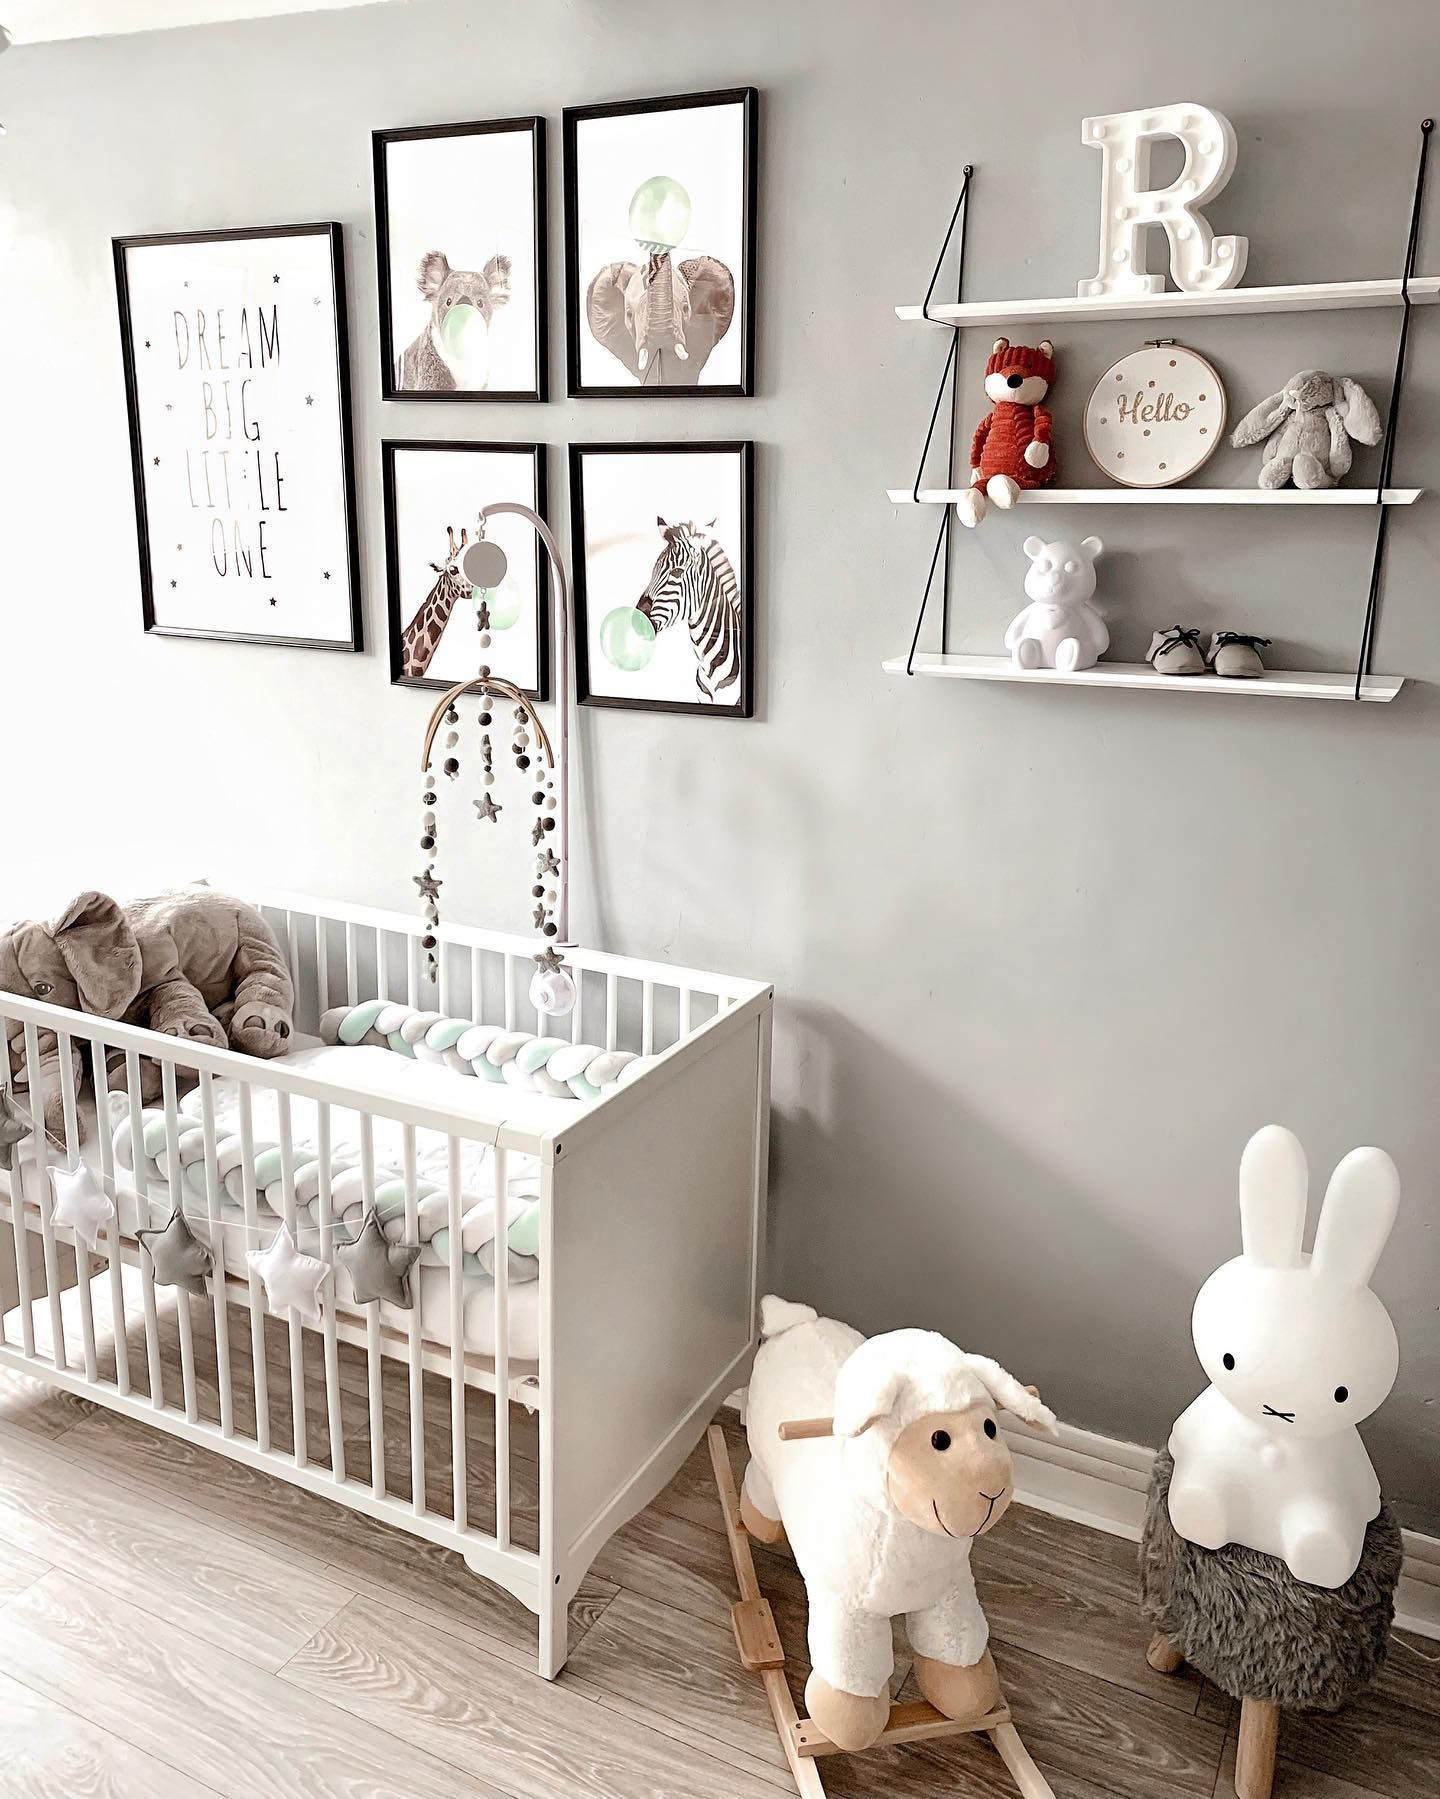 Gray Gender Neutral Nursery Gender Neutral Baby Room Baby Room Neutral Baby Room Decor